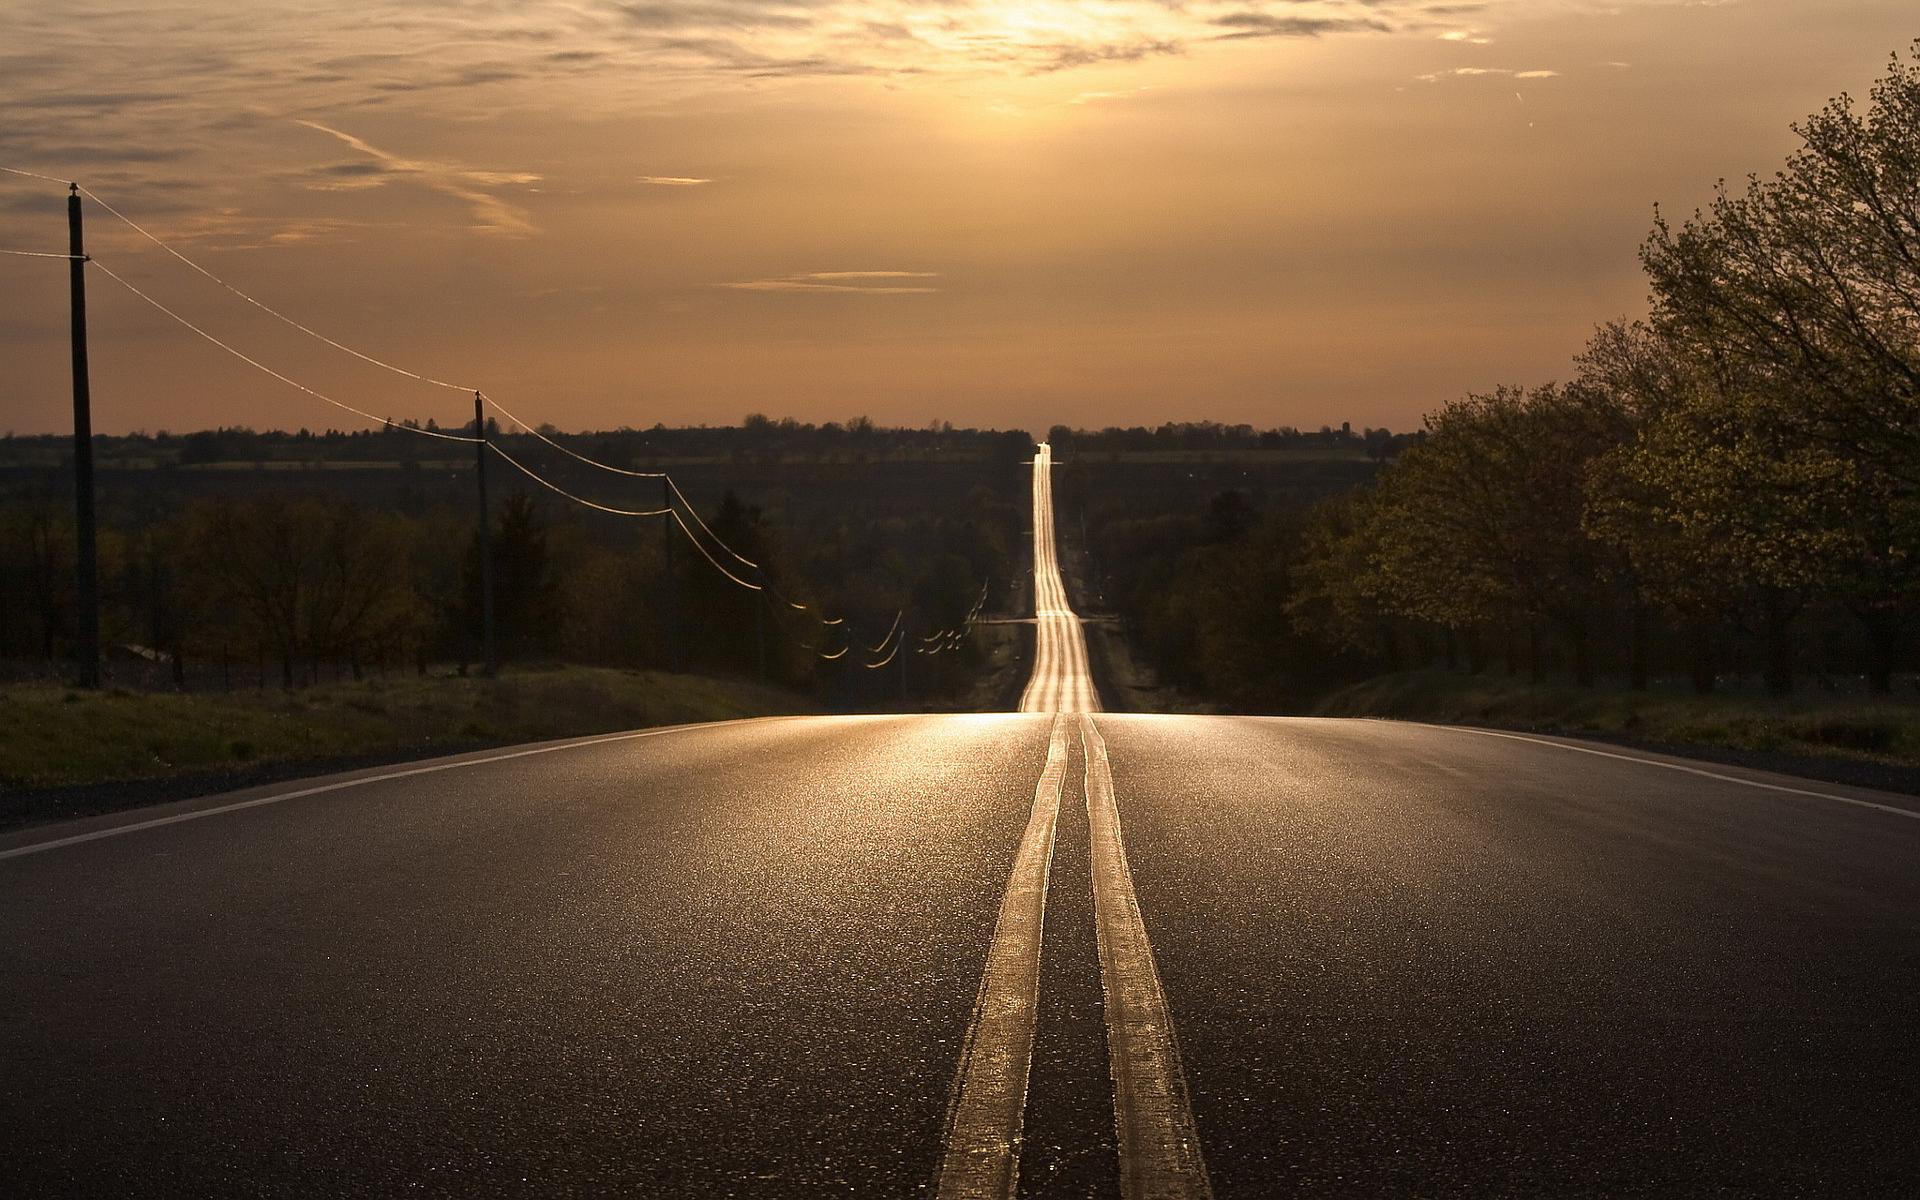 Sunset straight road